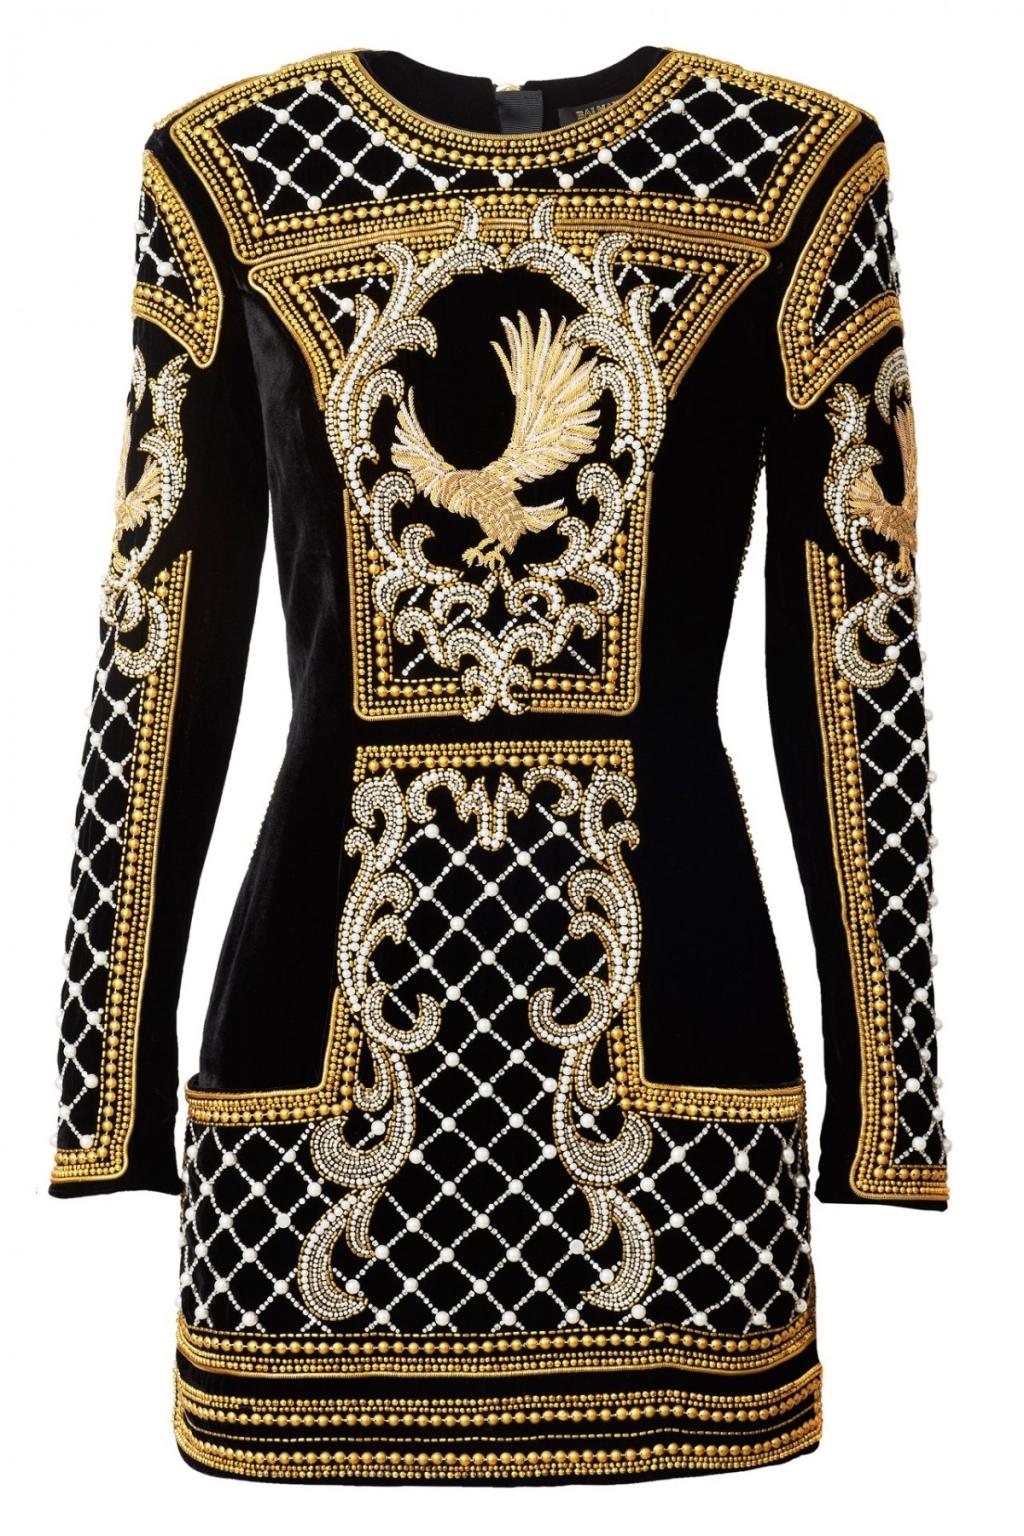 Balmain-x-HM-Beaded-Dress-Women-1200x1800